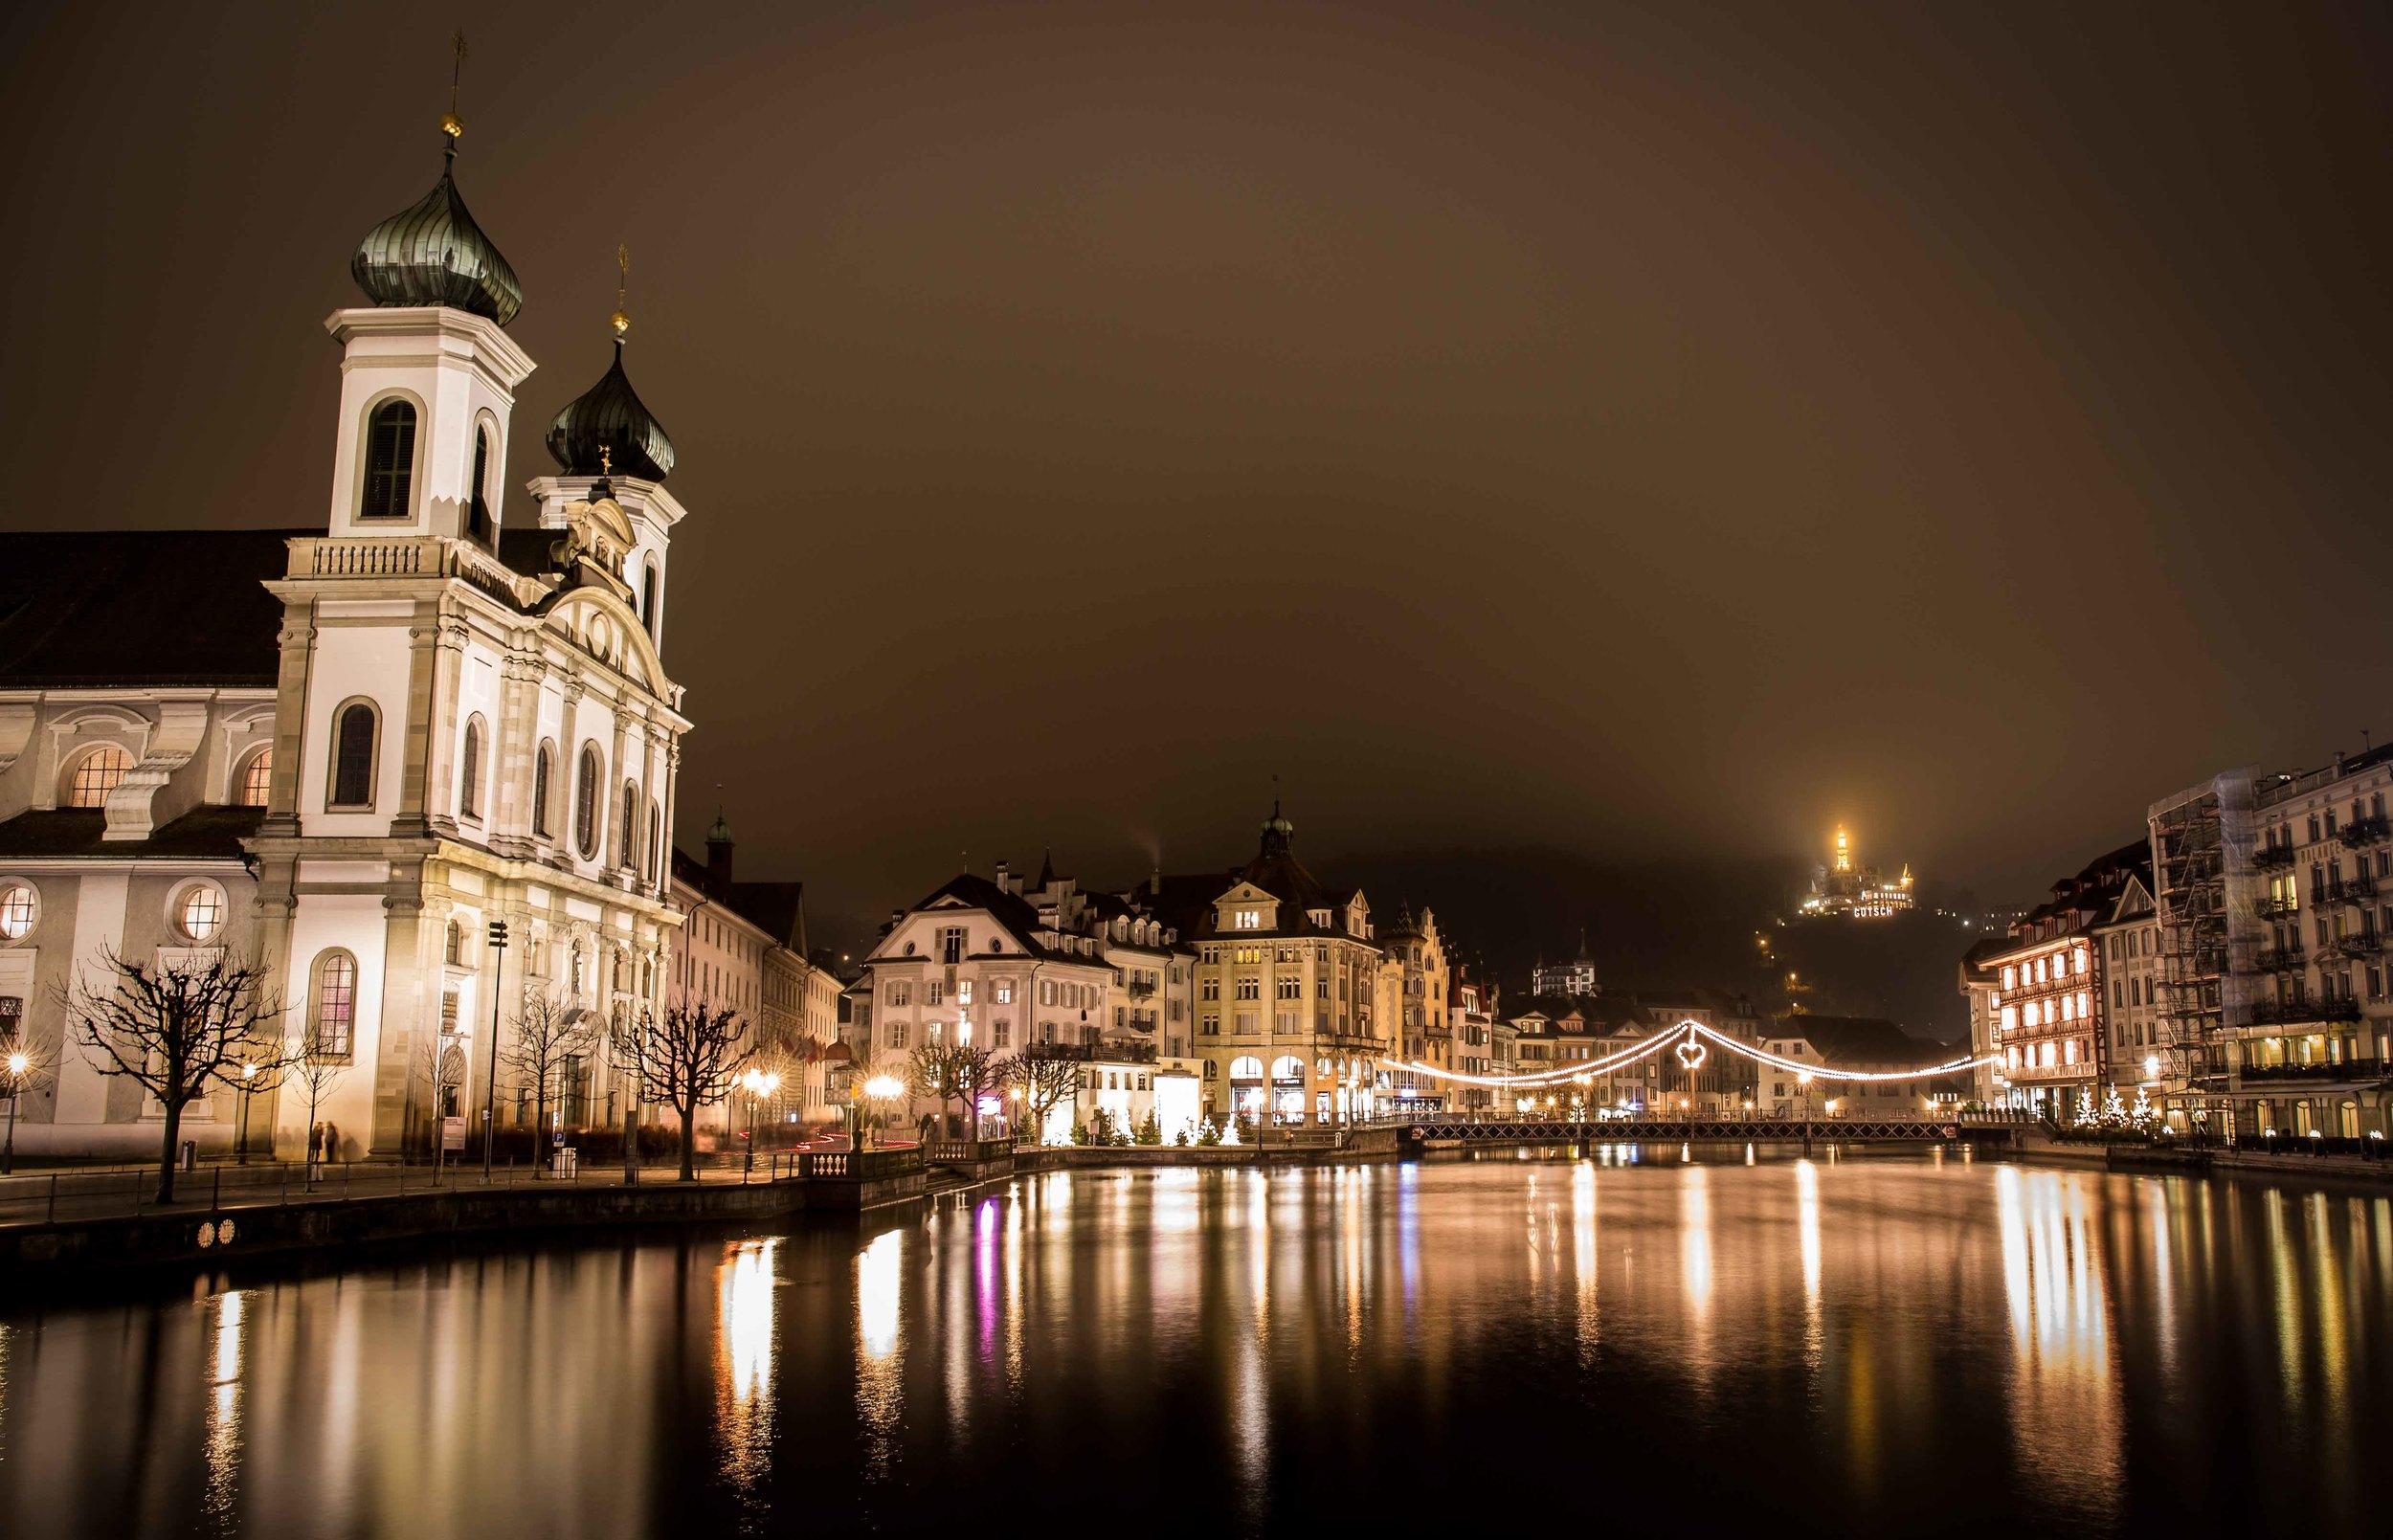 Jesuitenkirche Gütsch Nachts-.jpg